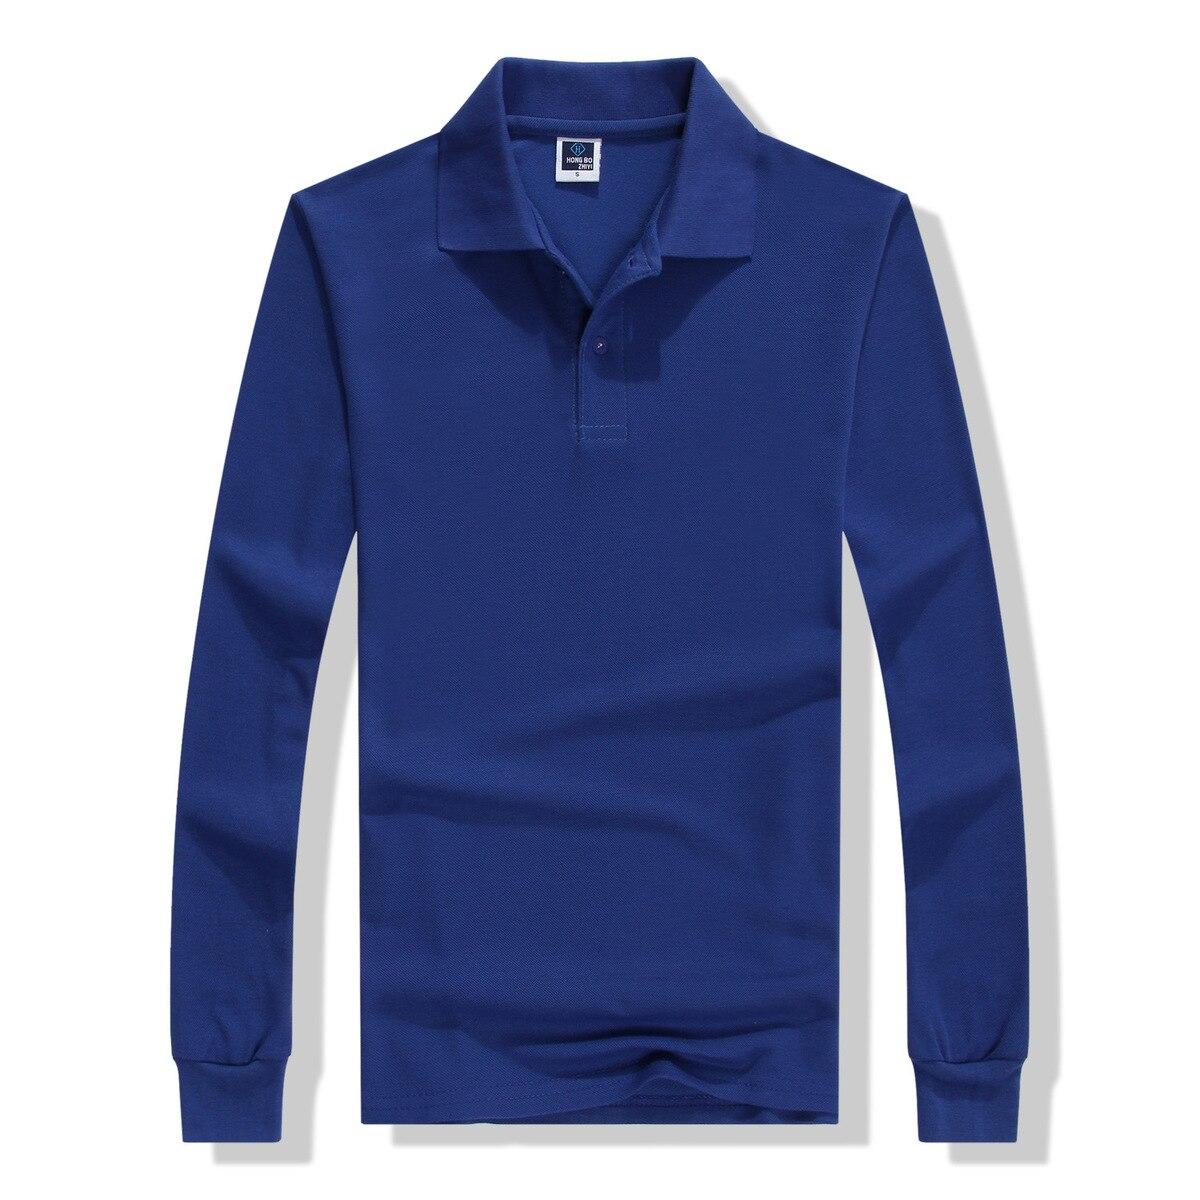 2018 Autumn Breathable Cotton Slim Polo Shirts Men Long Sleeve Camiseta Fashion Collar Fitness Solid Male Embroidery Print Logo